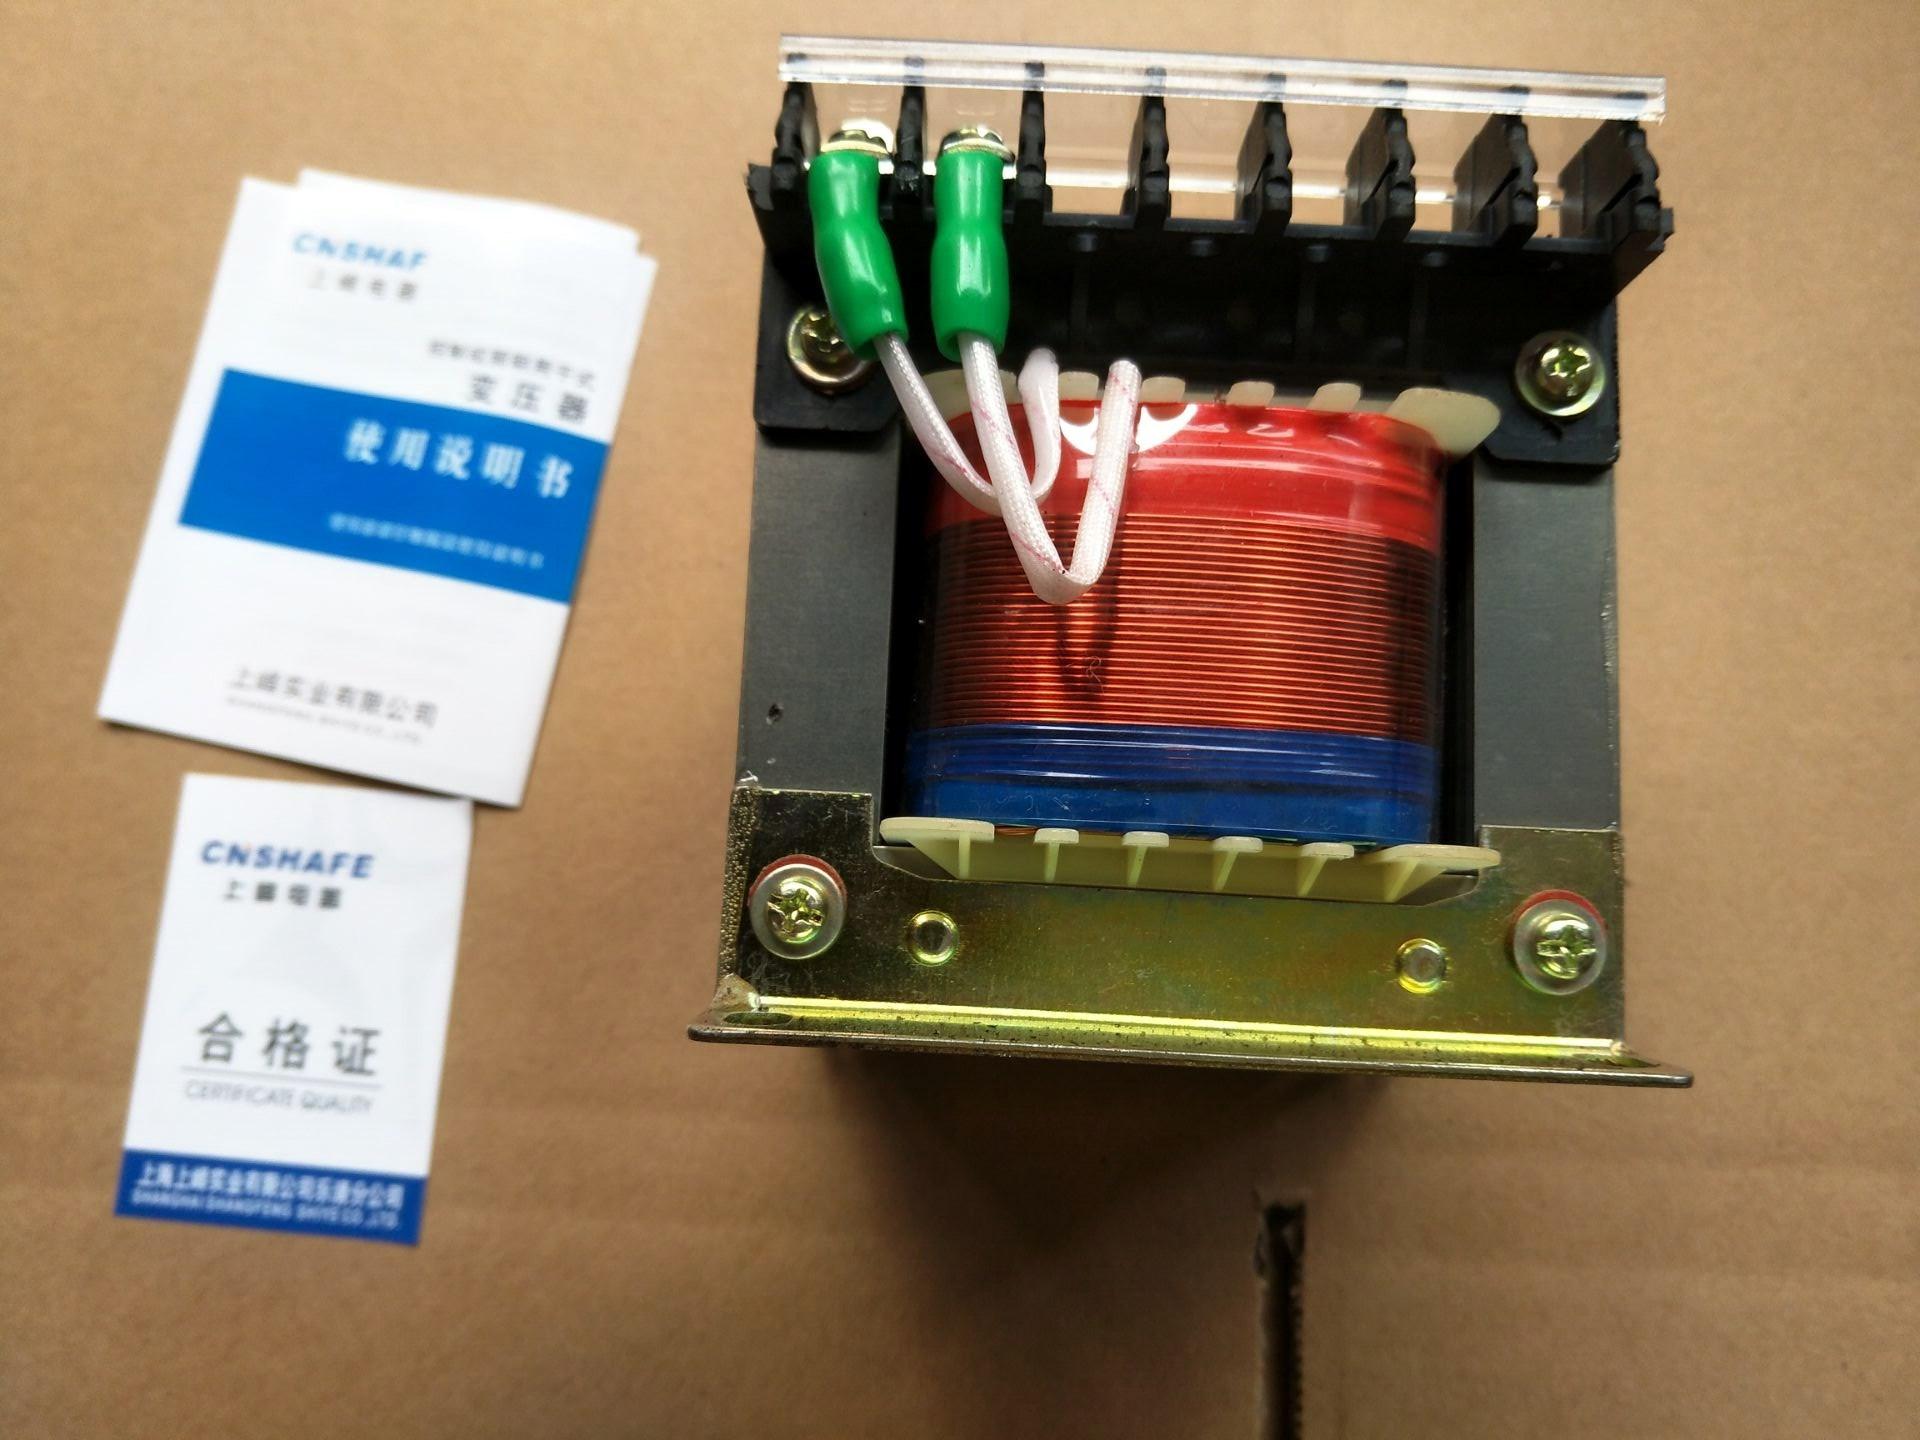 JBK3-200VA машина за контрол на трансформатор, 380V220V се 110V48V36V24V12V